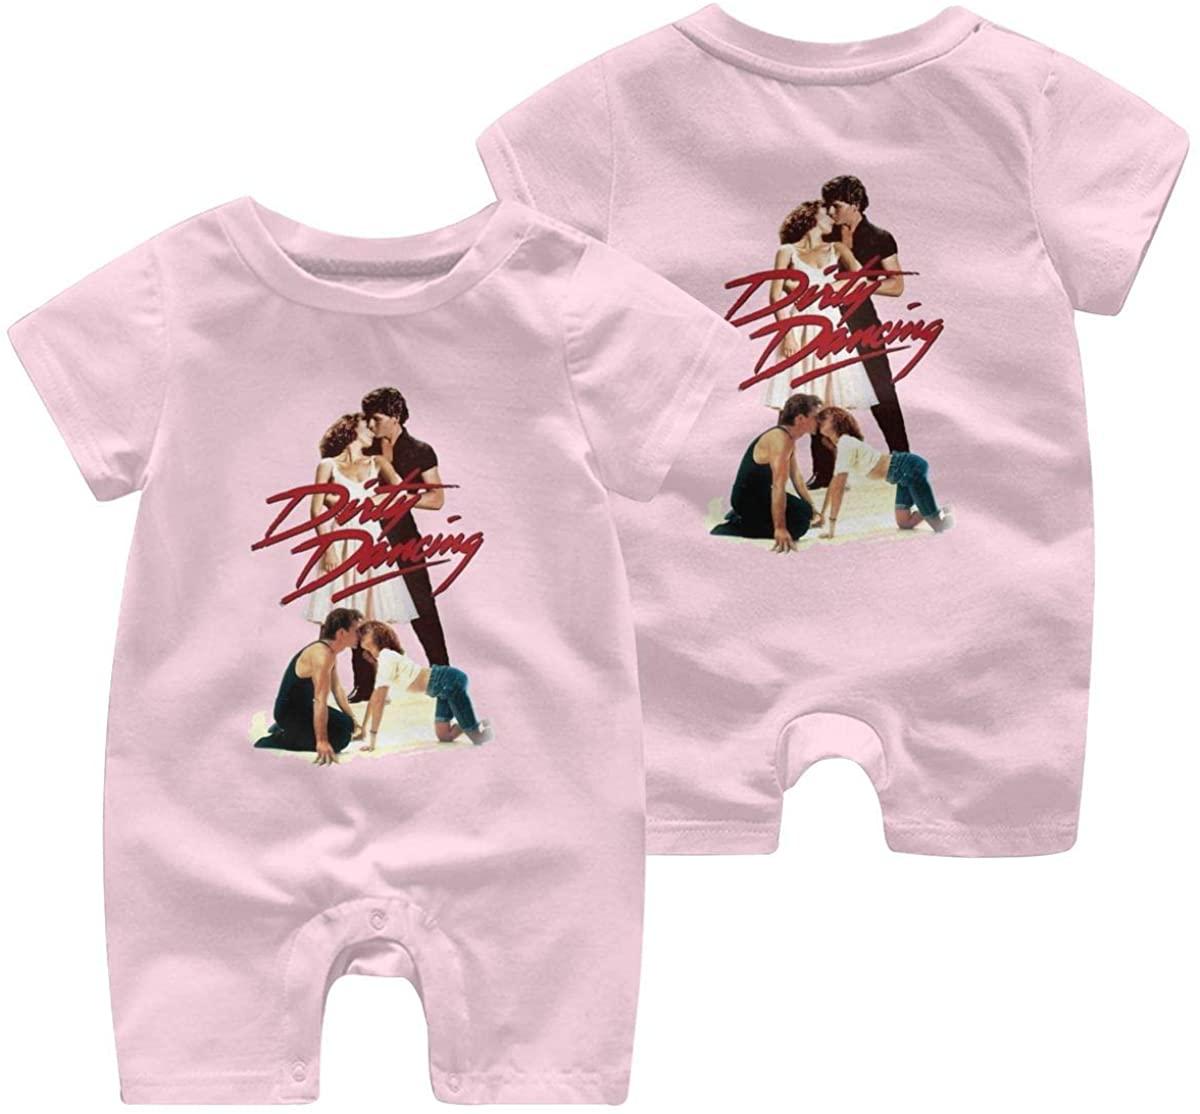 Qwtykeertyi Dirty Dancing Comfortable Baby Short Sleeve Jumpsuit Kid Baby Pajama Sleeper Cotton Romper